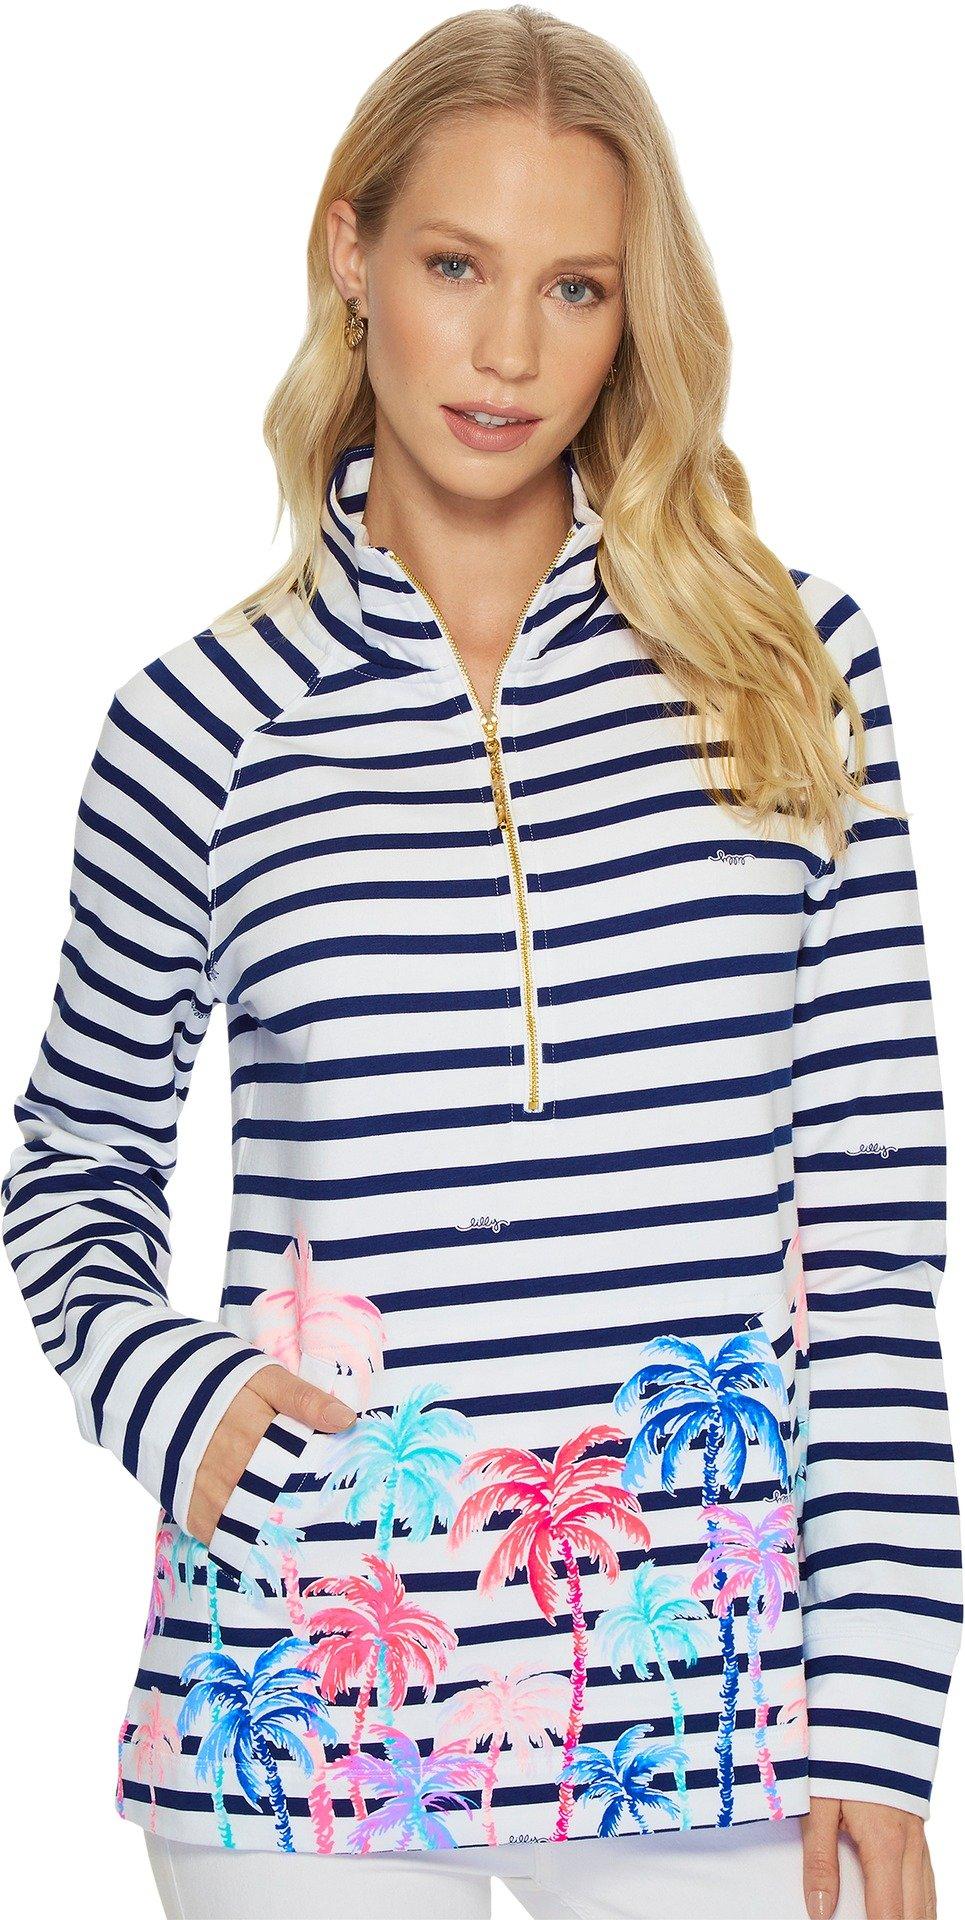 Lilly Pulitzer Women's UPF 50+ Skipper Popover Resort White Desert Palm Stripe Engineered Skipper Small